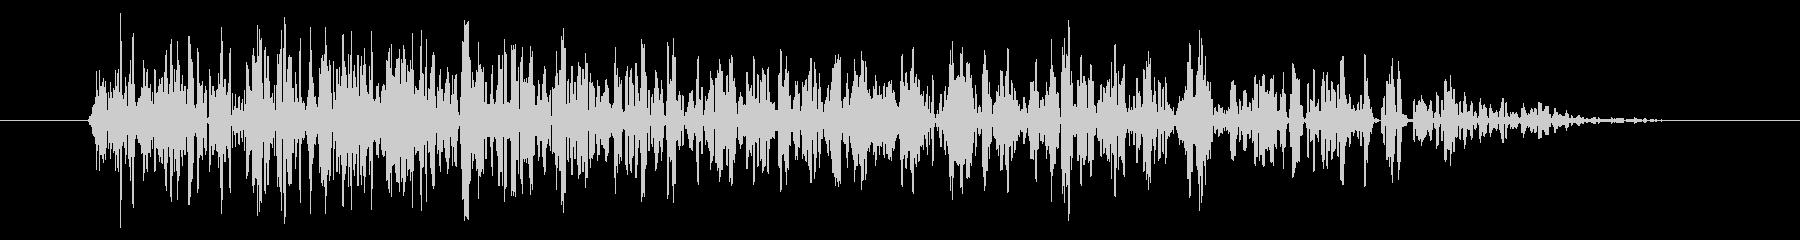 SNES シューティング02-06(ミサの未再生の波形